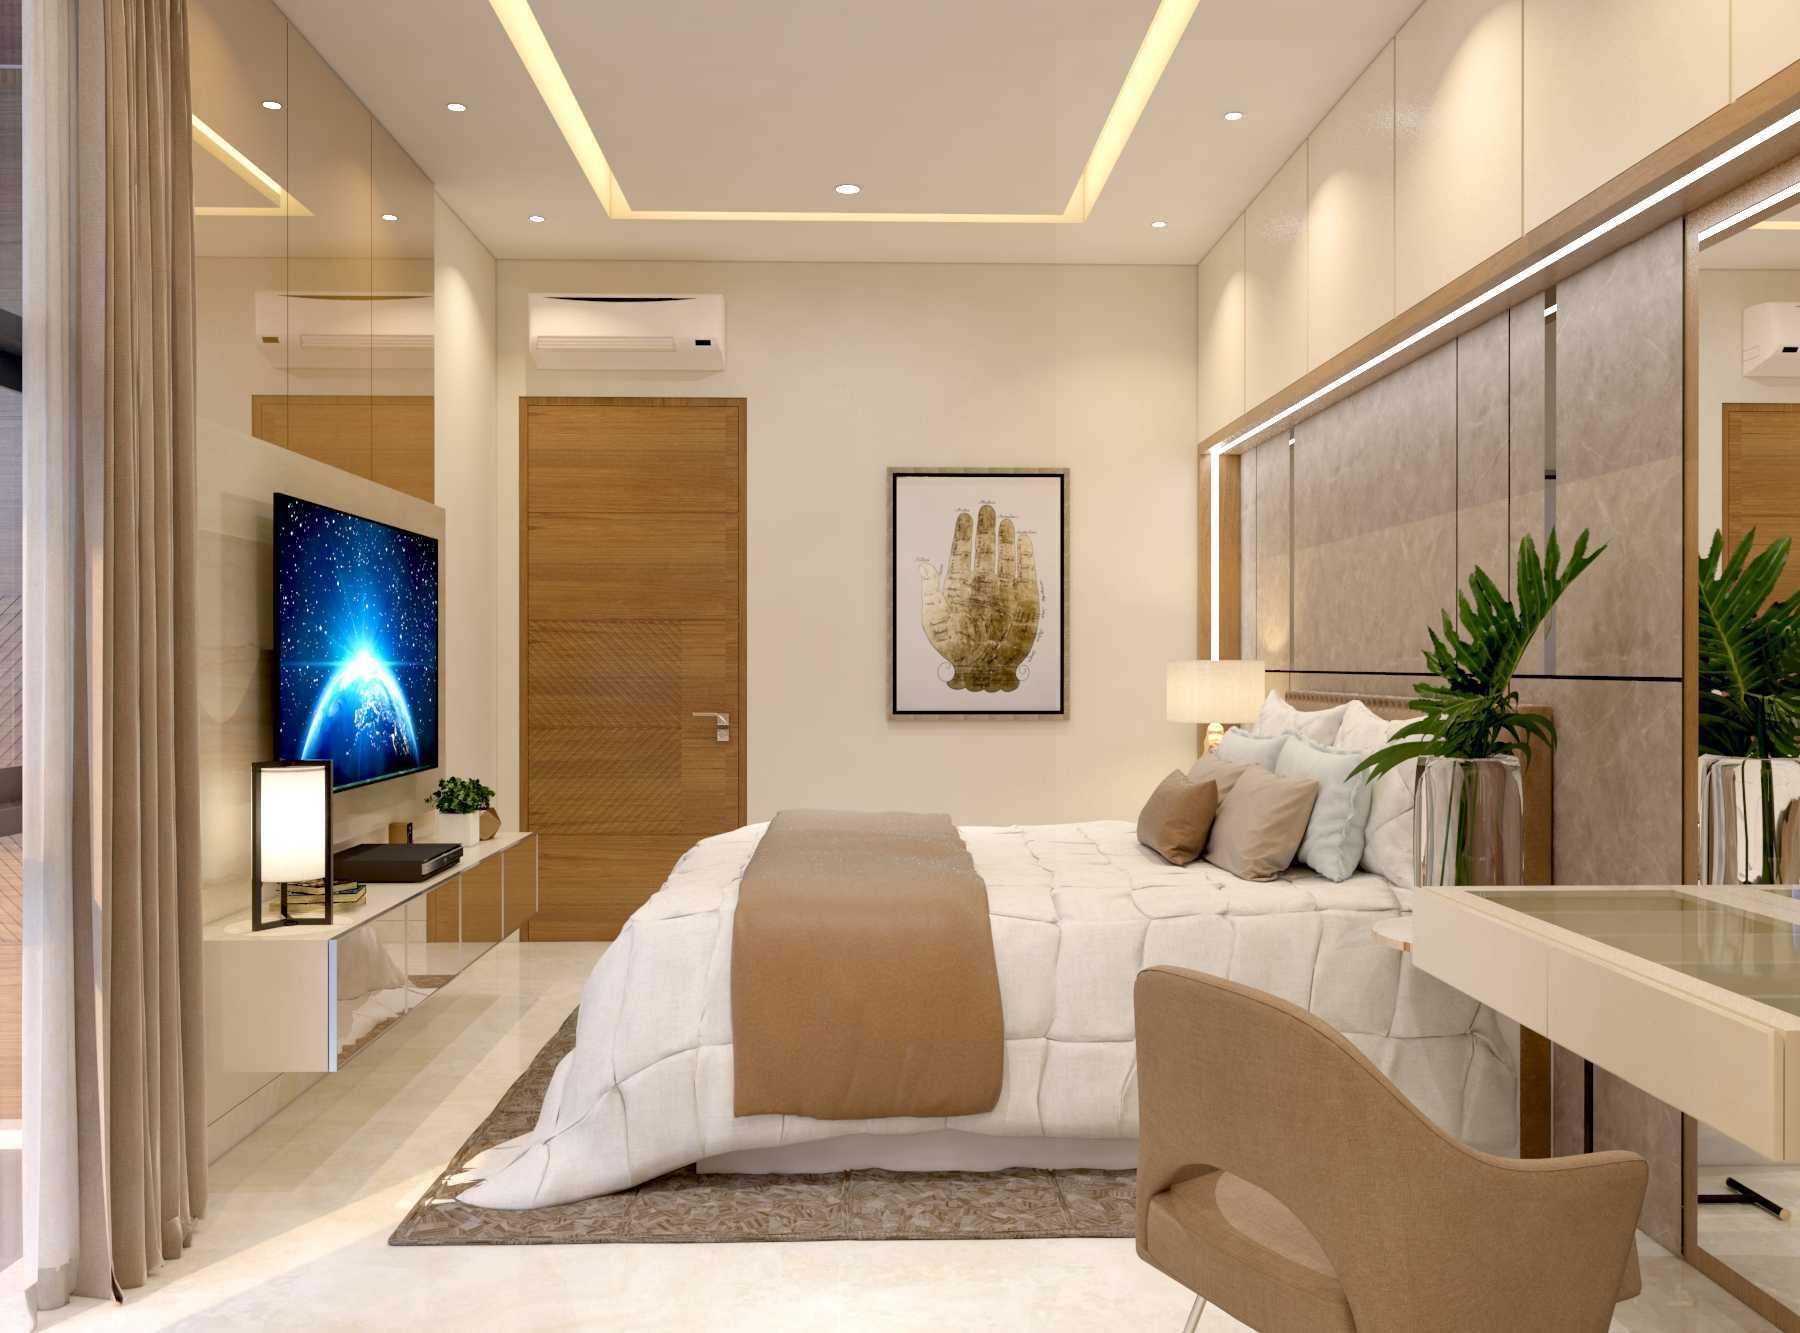 Conarch Studio Desain Minimalis Modern V House Surabaya, Kota Sby, Jawa Timur, Indonesia Surabaya, Kota Sby, Jawa Timur, Indonesia Conarch-Studio-Desain-Minimalis-Modern-V-House   134772